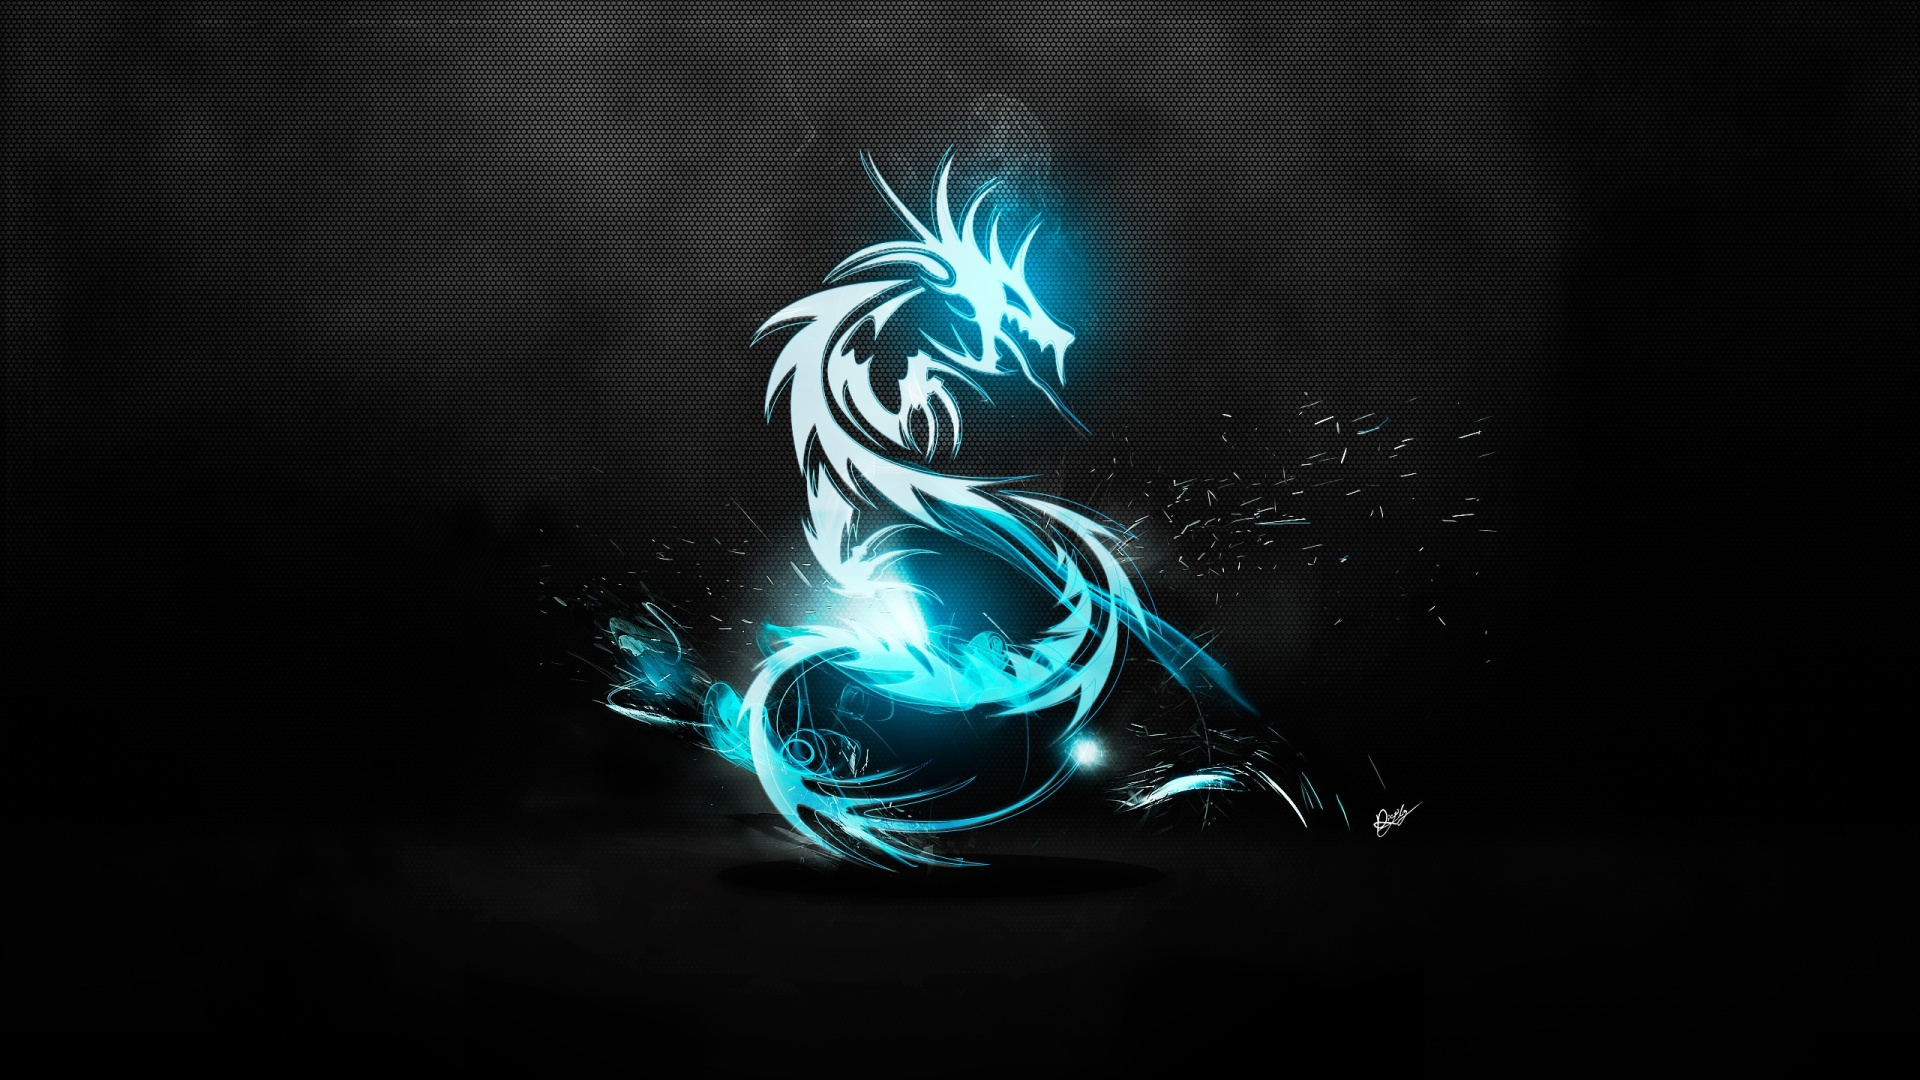 Blue Dragon | Full HD Desktop Wallpapers 1080p